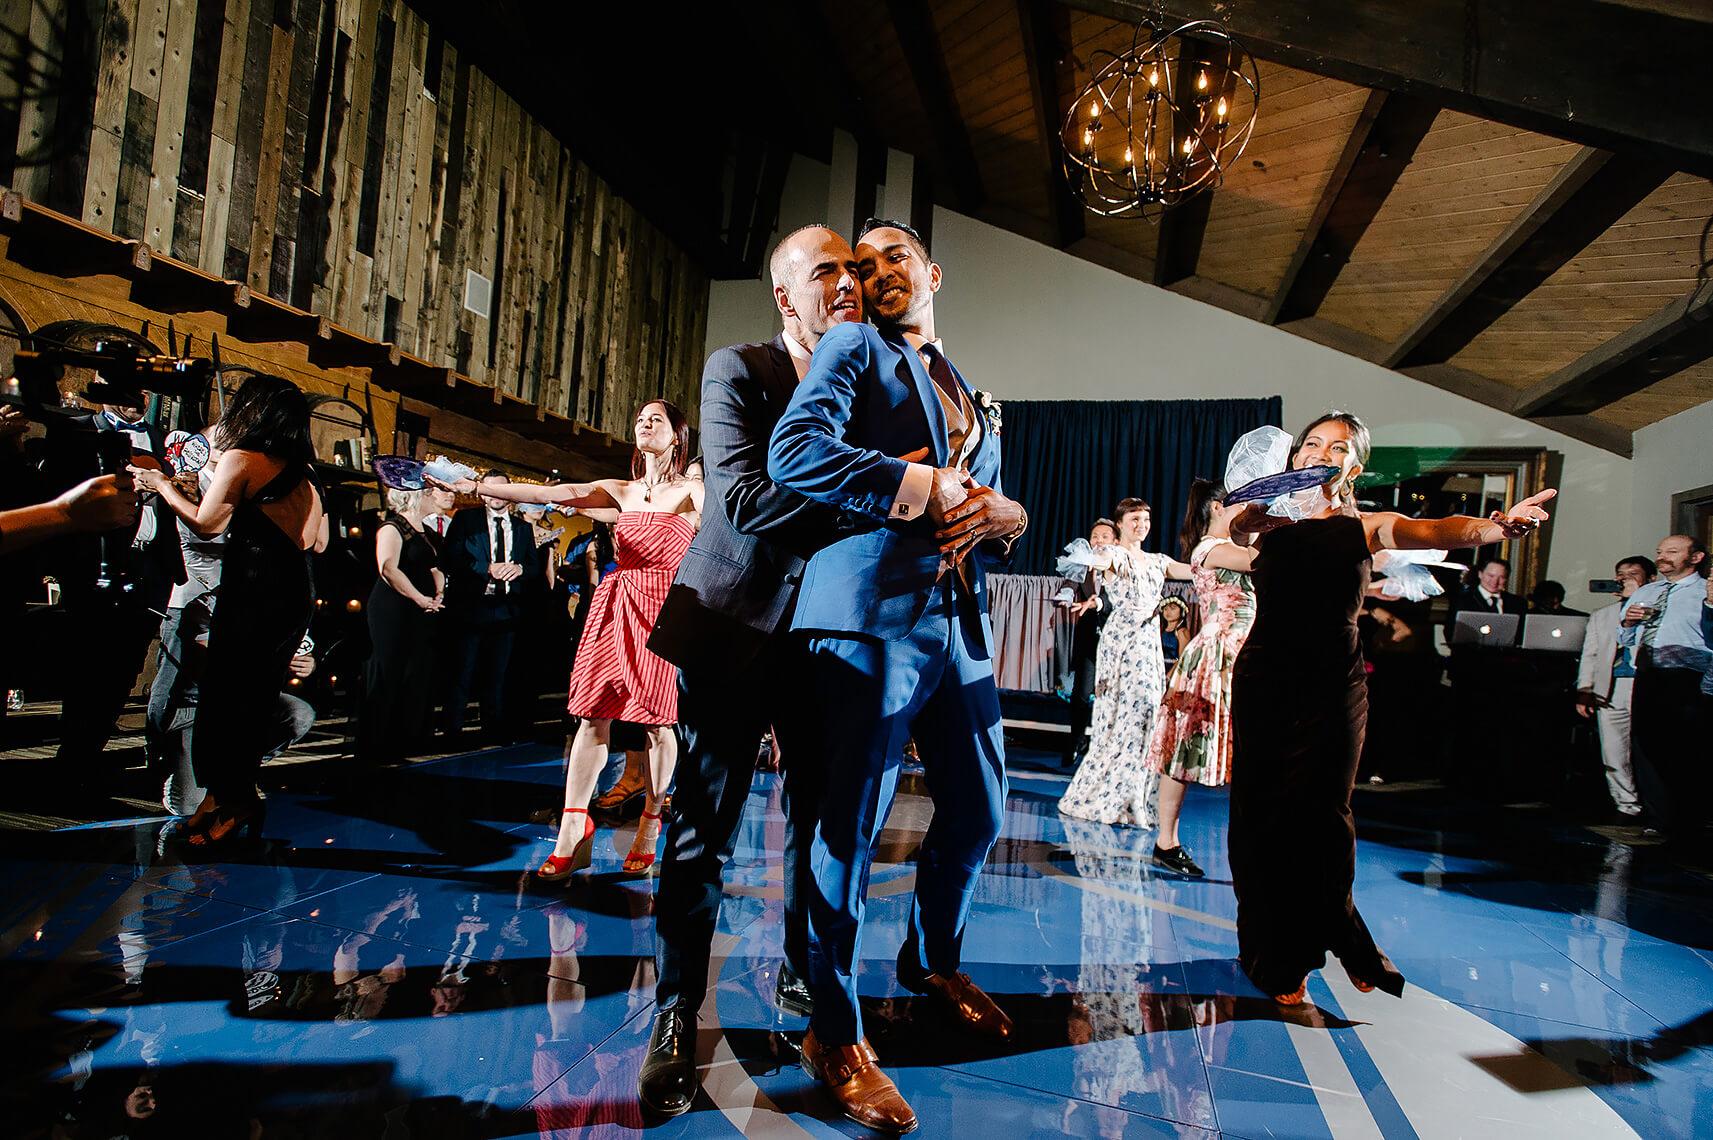 malibu-calamigos-ranch-same-sex-wedding-photographer-los-angeles-29.jpg